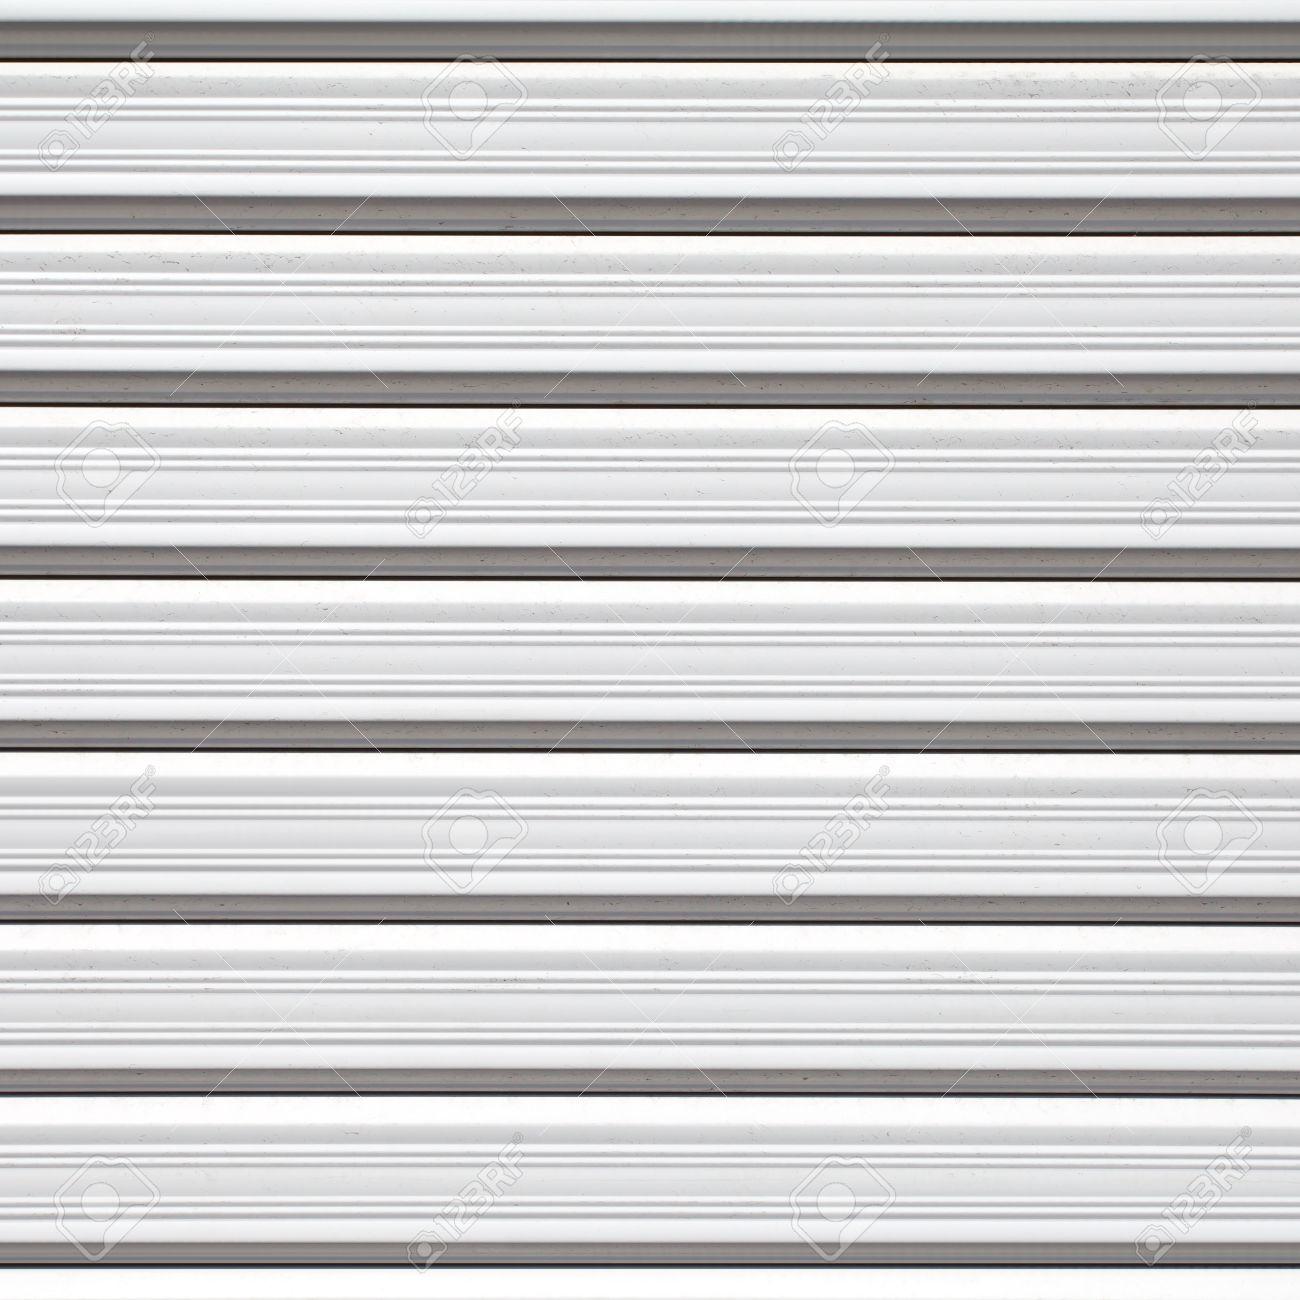 Stock Photo   Texture Of Stainless Roller Shutter Door